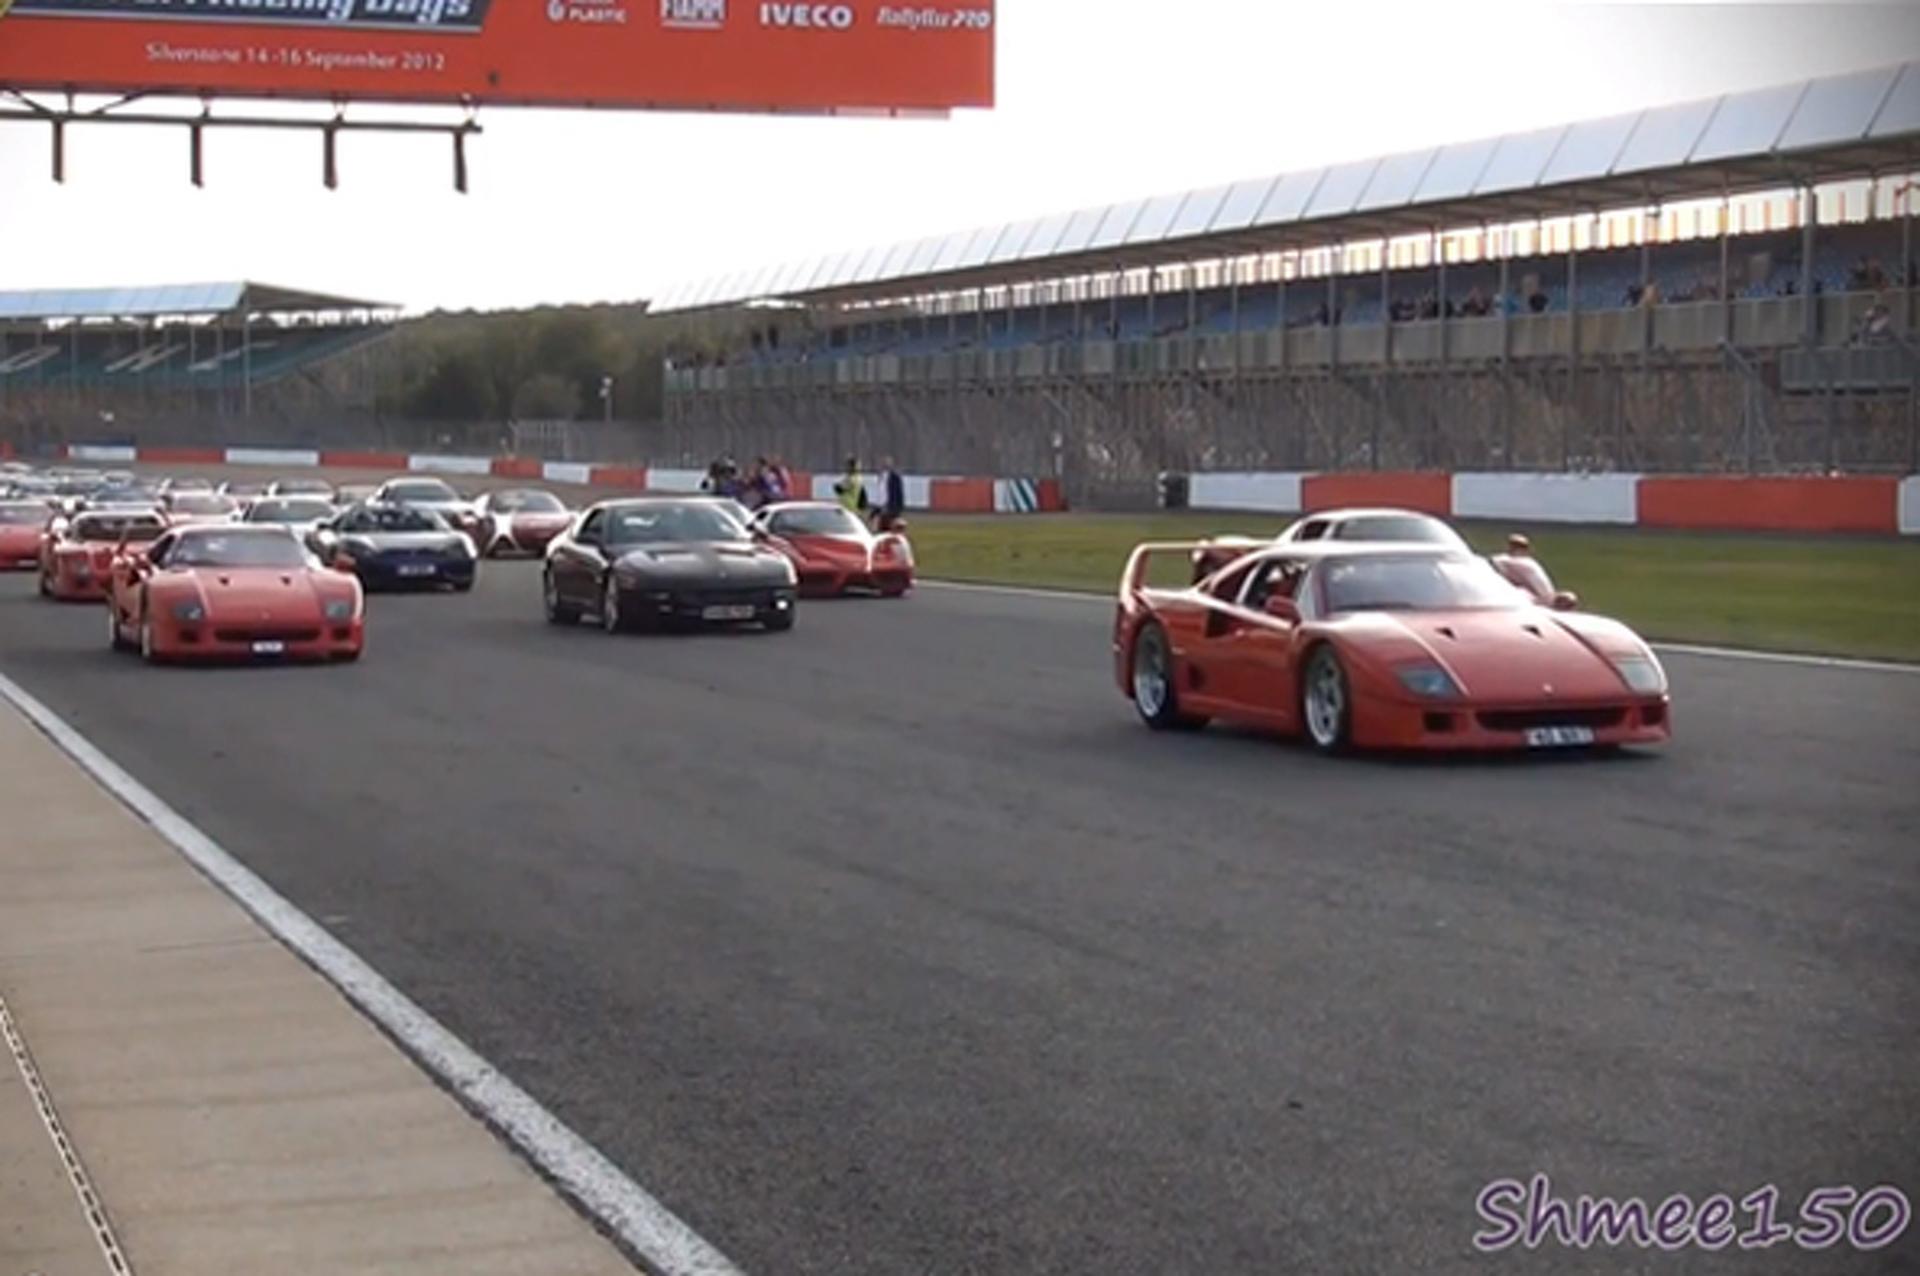 964 Ferraris Break World Record at Silverstone